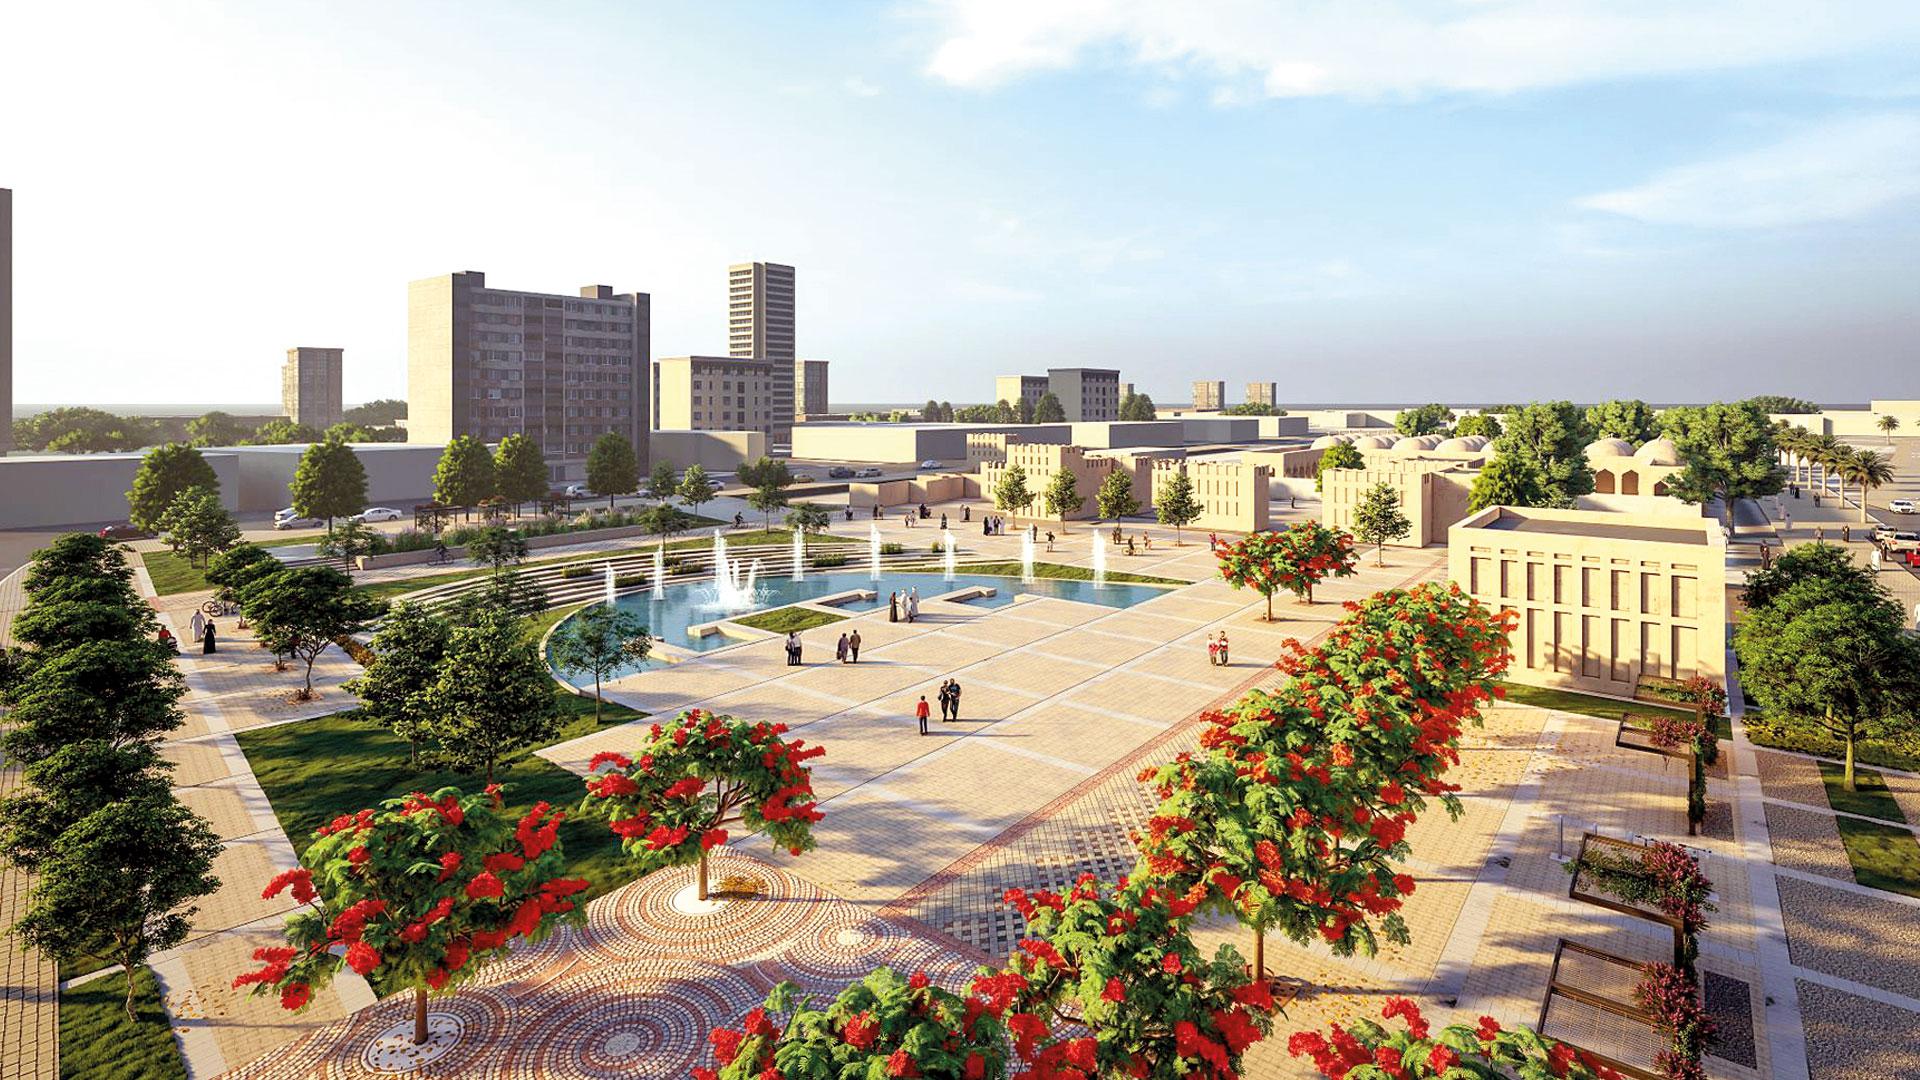 Work Starts on Construction of Masjid Al Qubib Plaza